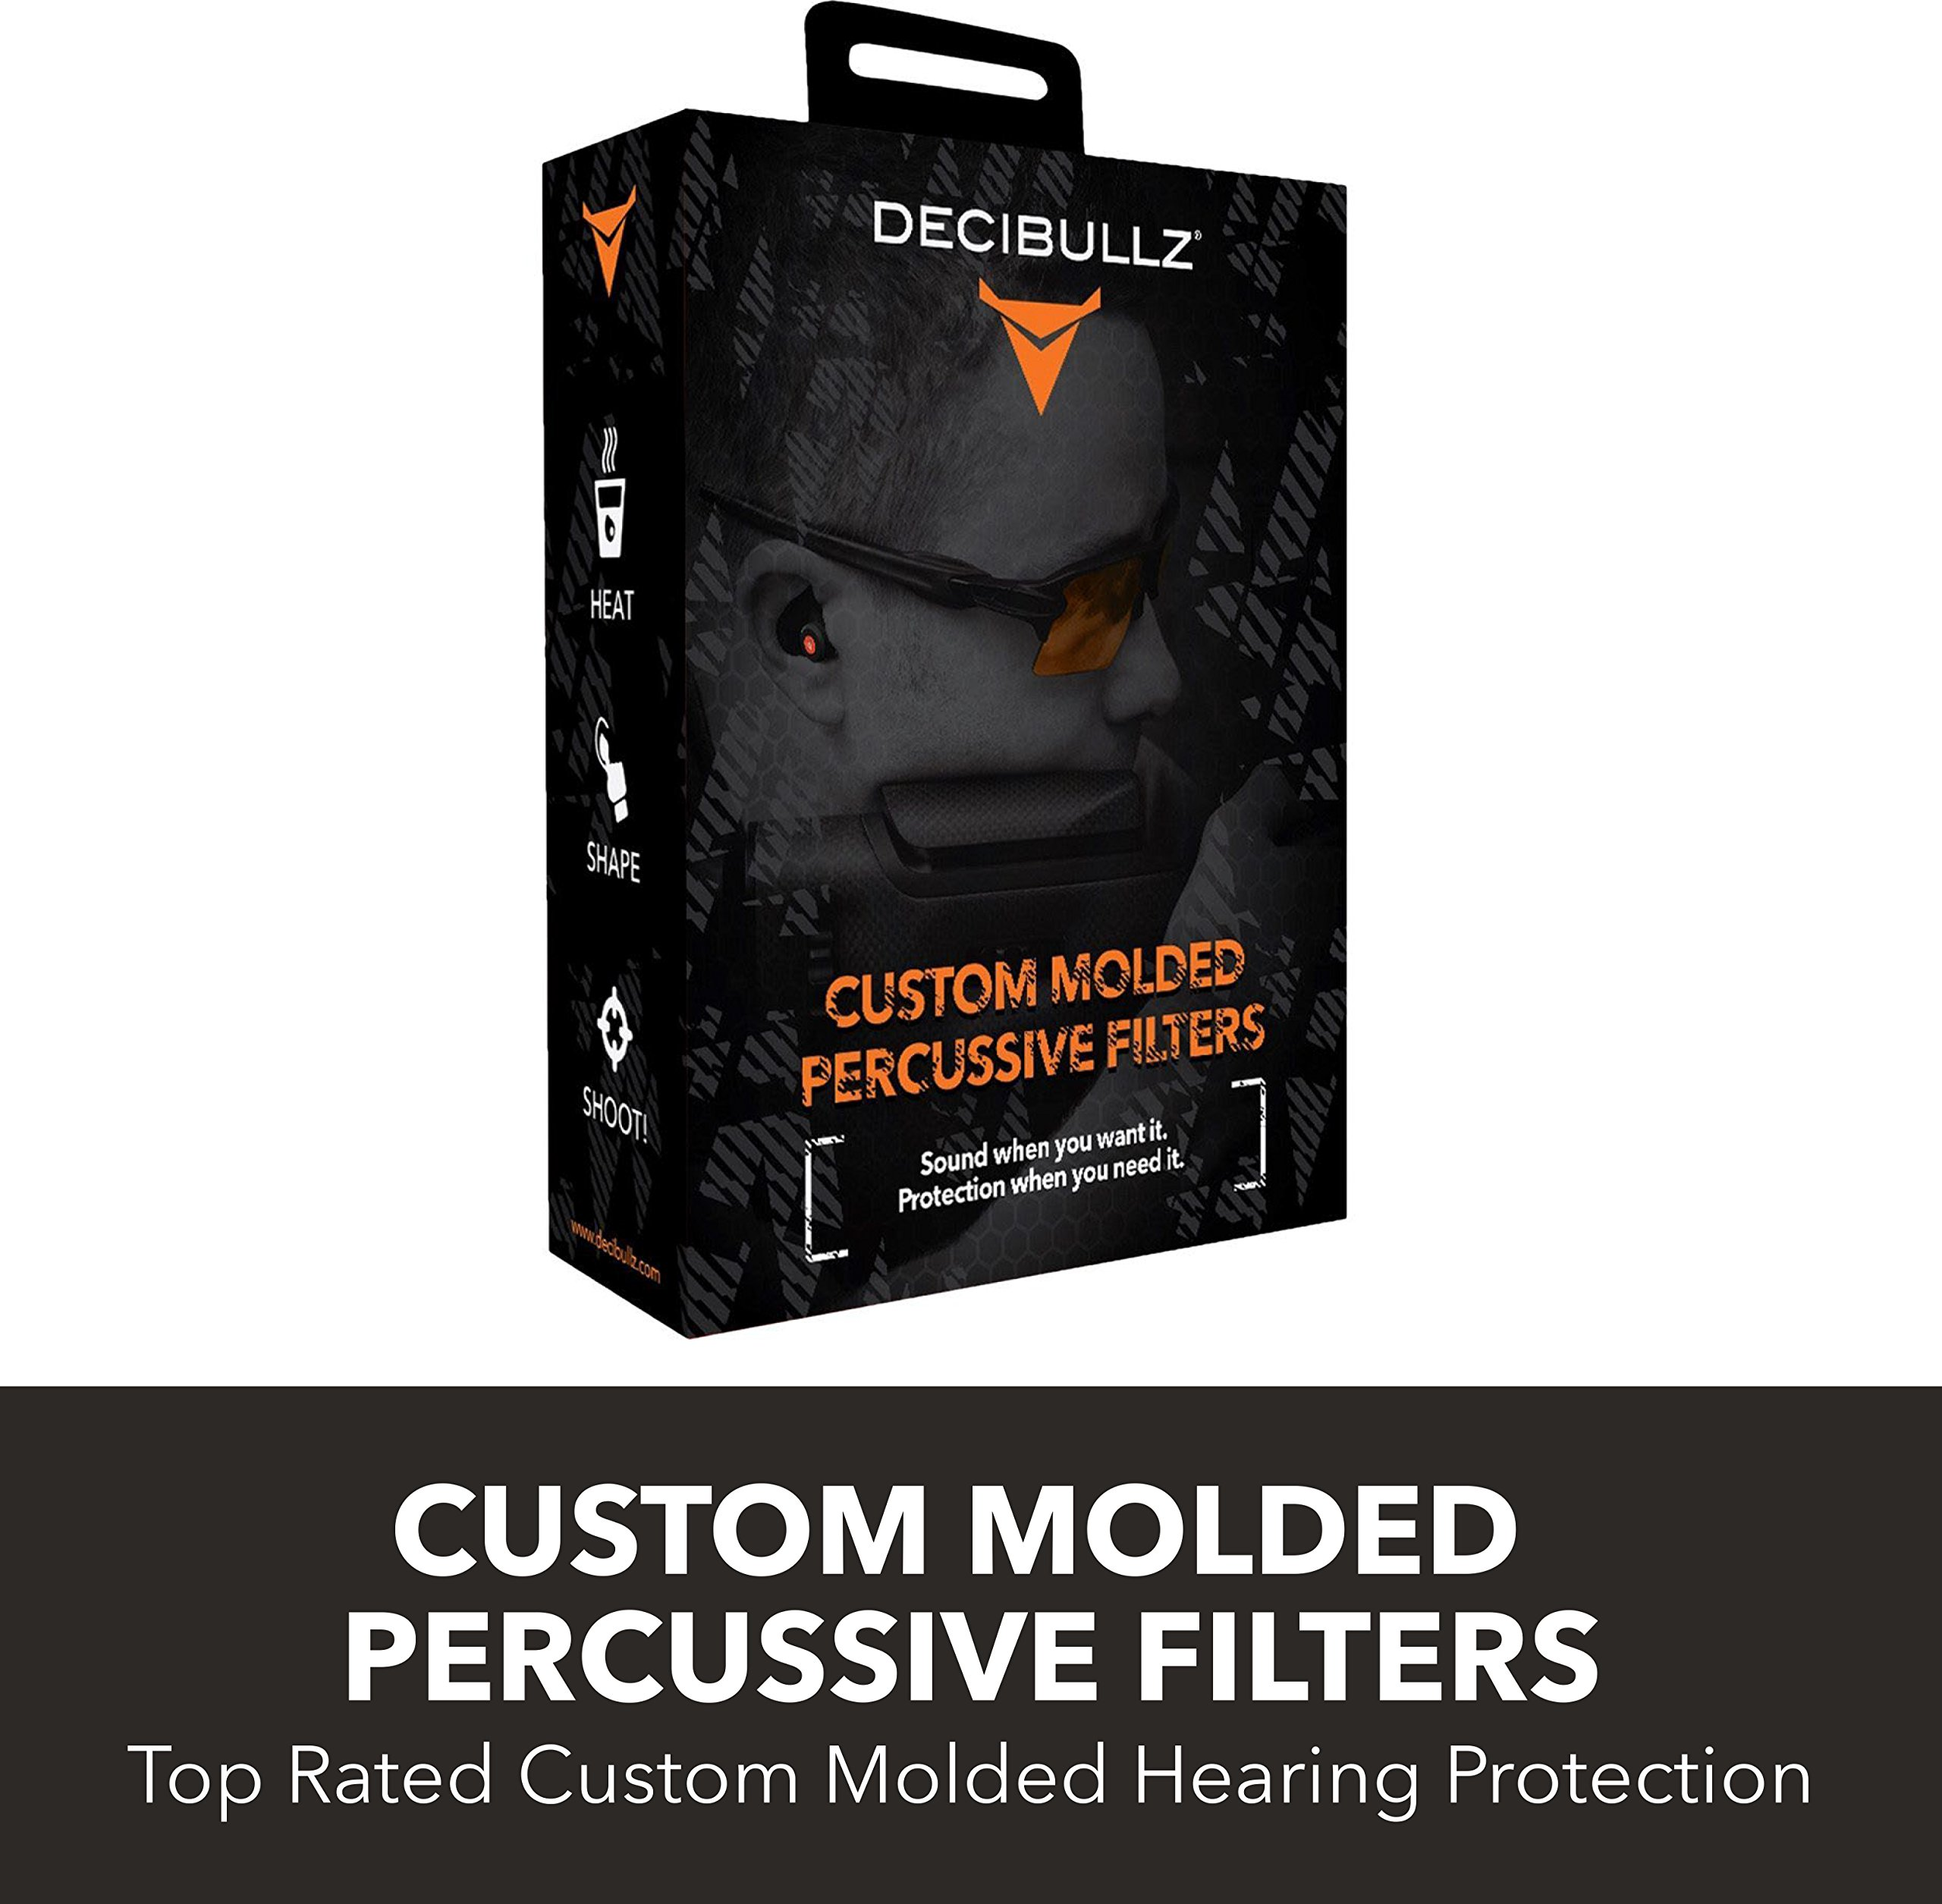 Decibullz - Custom Molded Percussive Filters, Custom Molded Hearing Protection by Decibullz